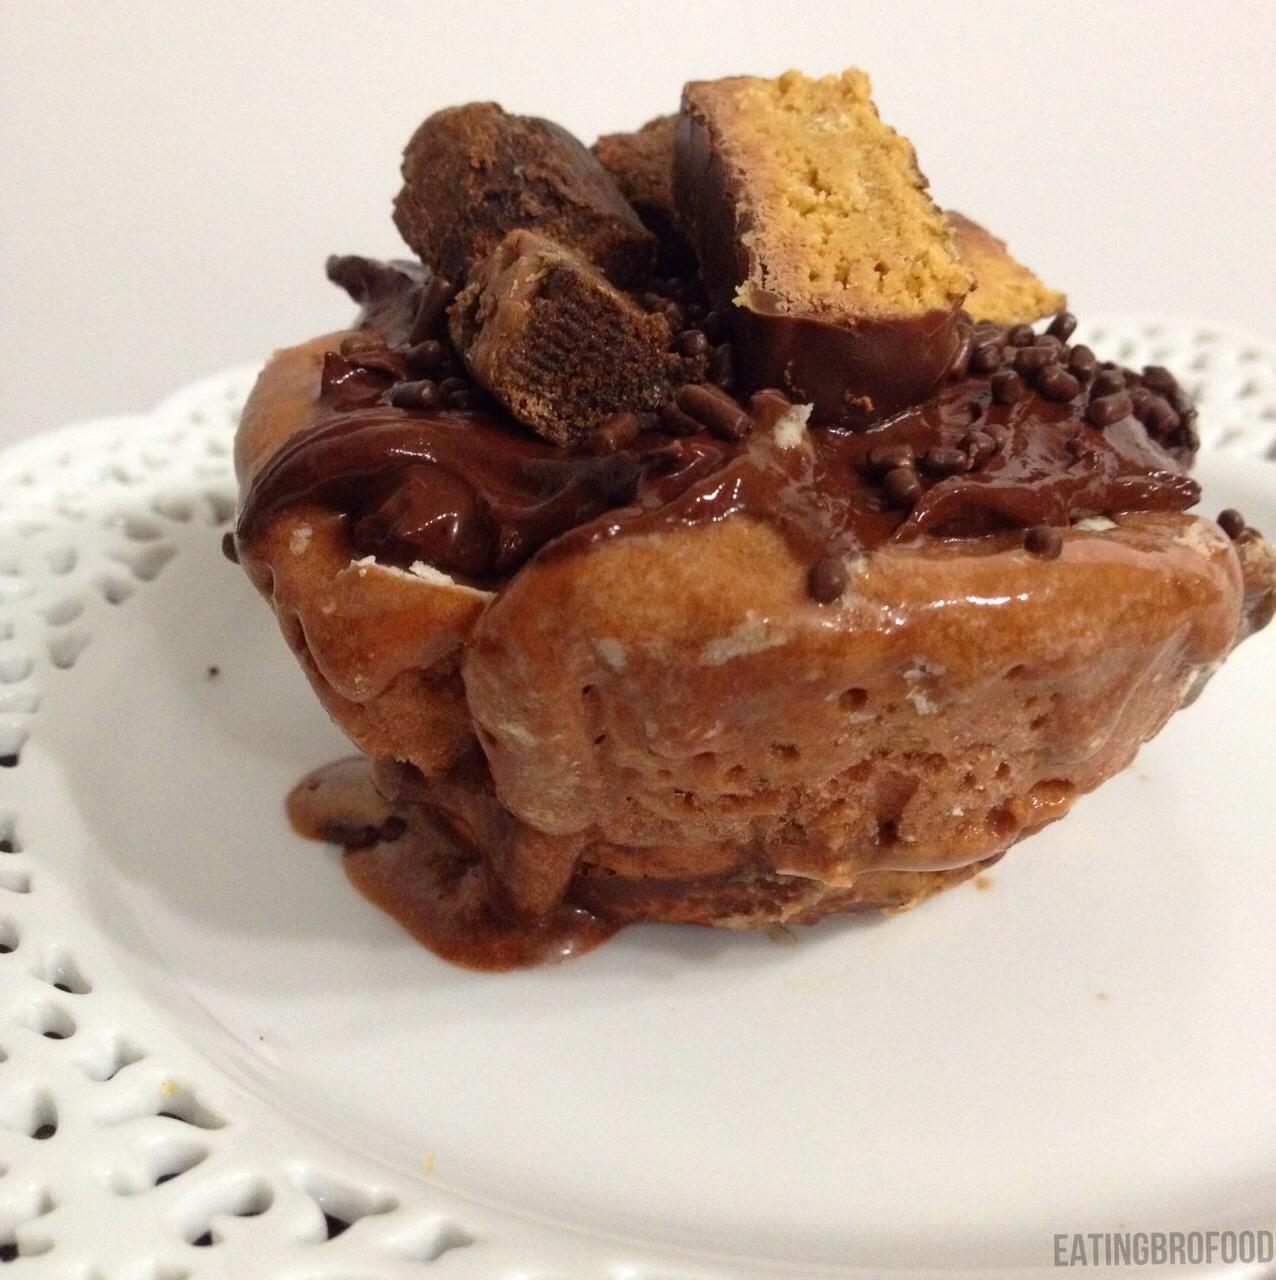 Nutty Caramel Ice Cream Cake